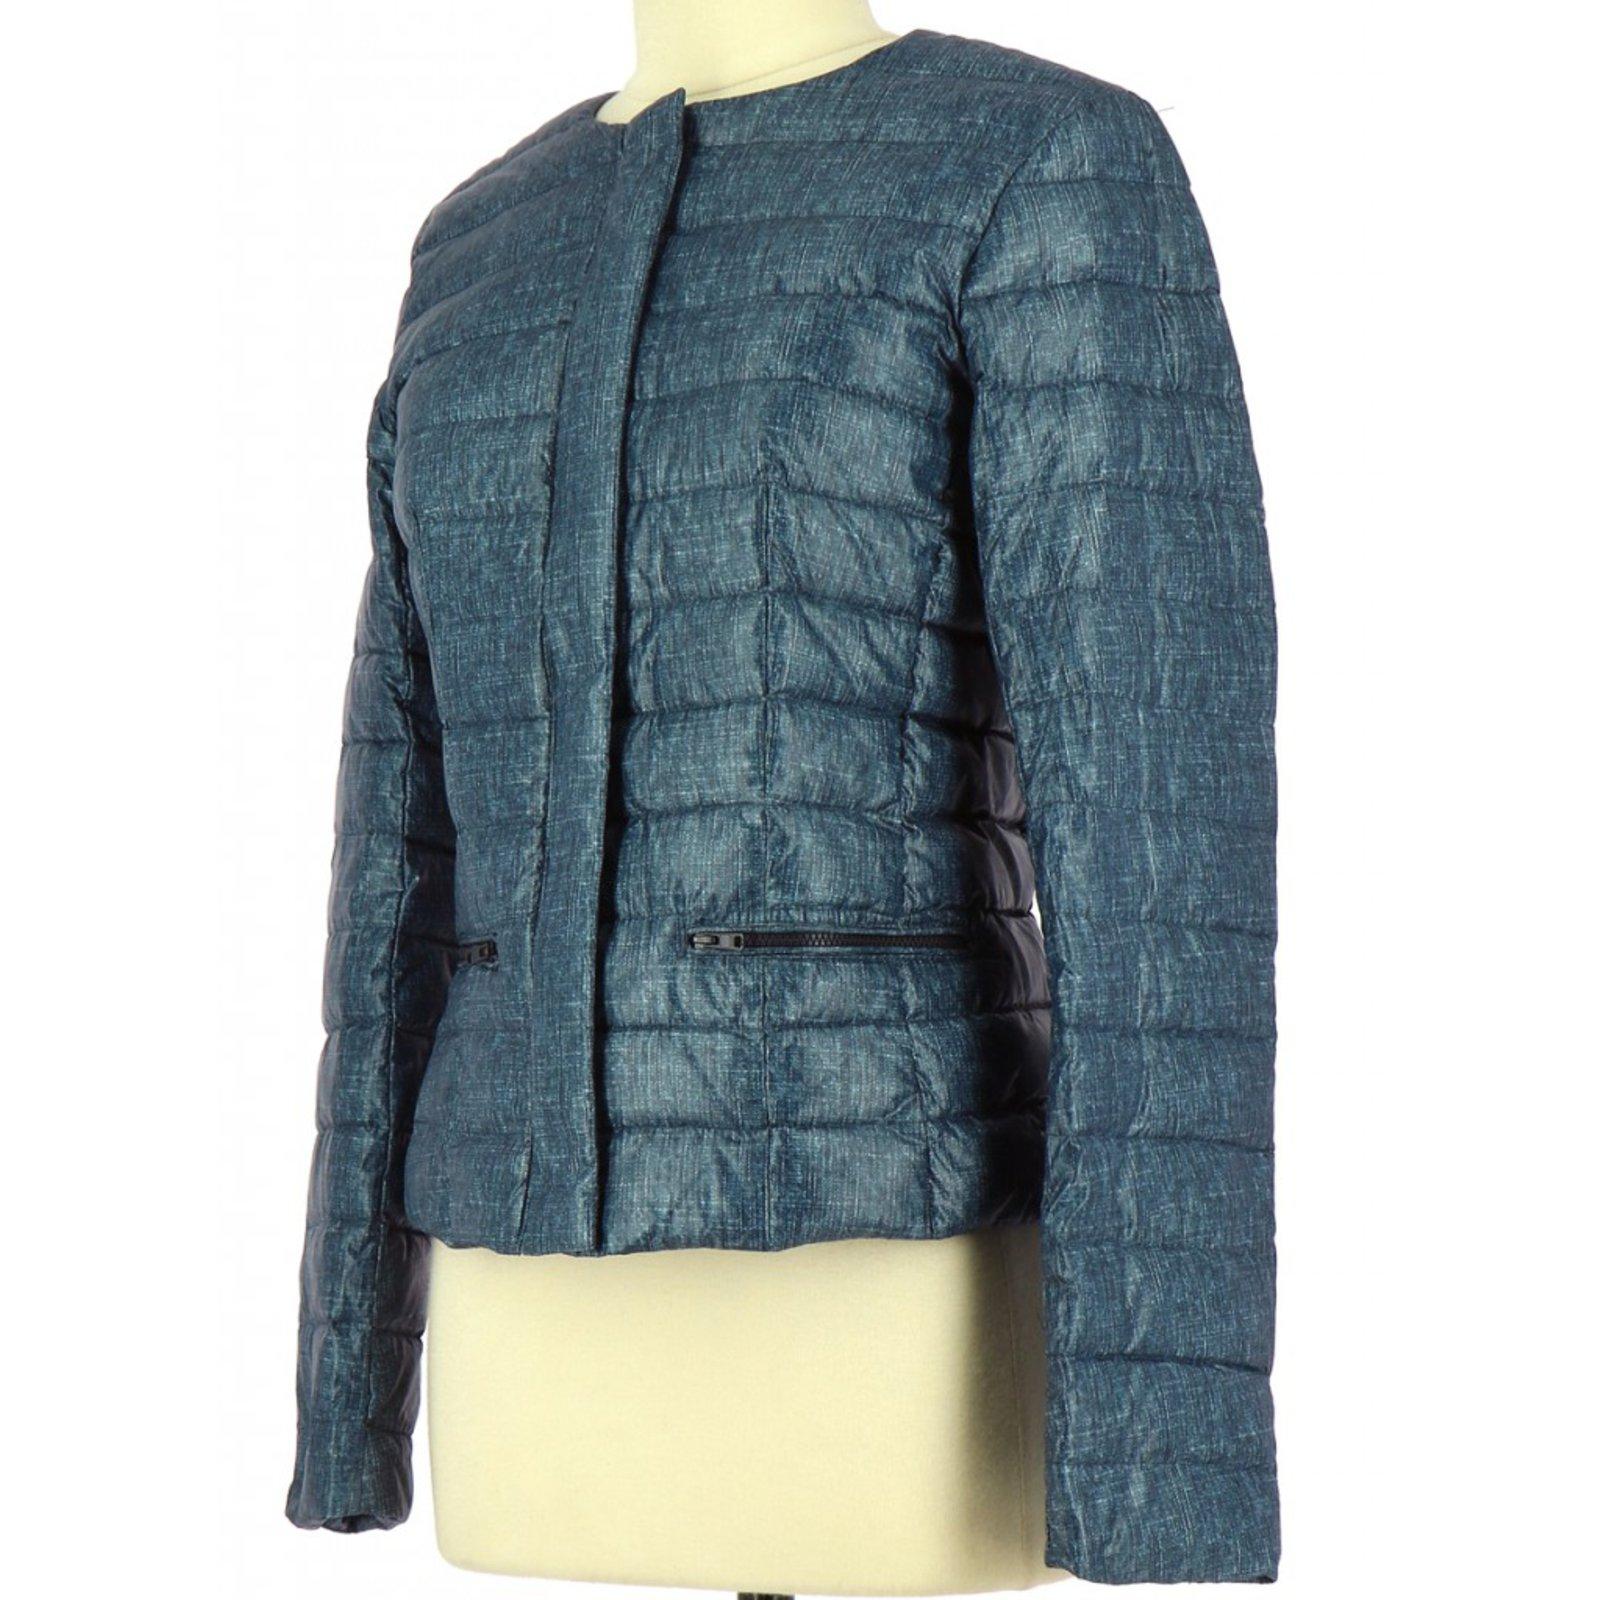 Manteaux CAROLL Doudoune   Parka Polyester Bleu Marine ref.80795 - Joli  Closet 15849c36a9a